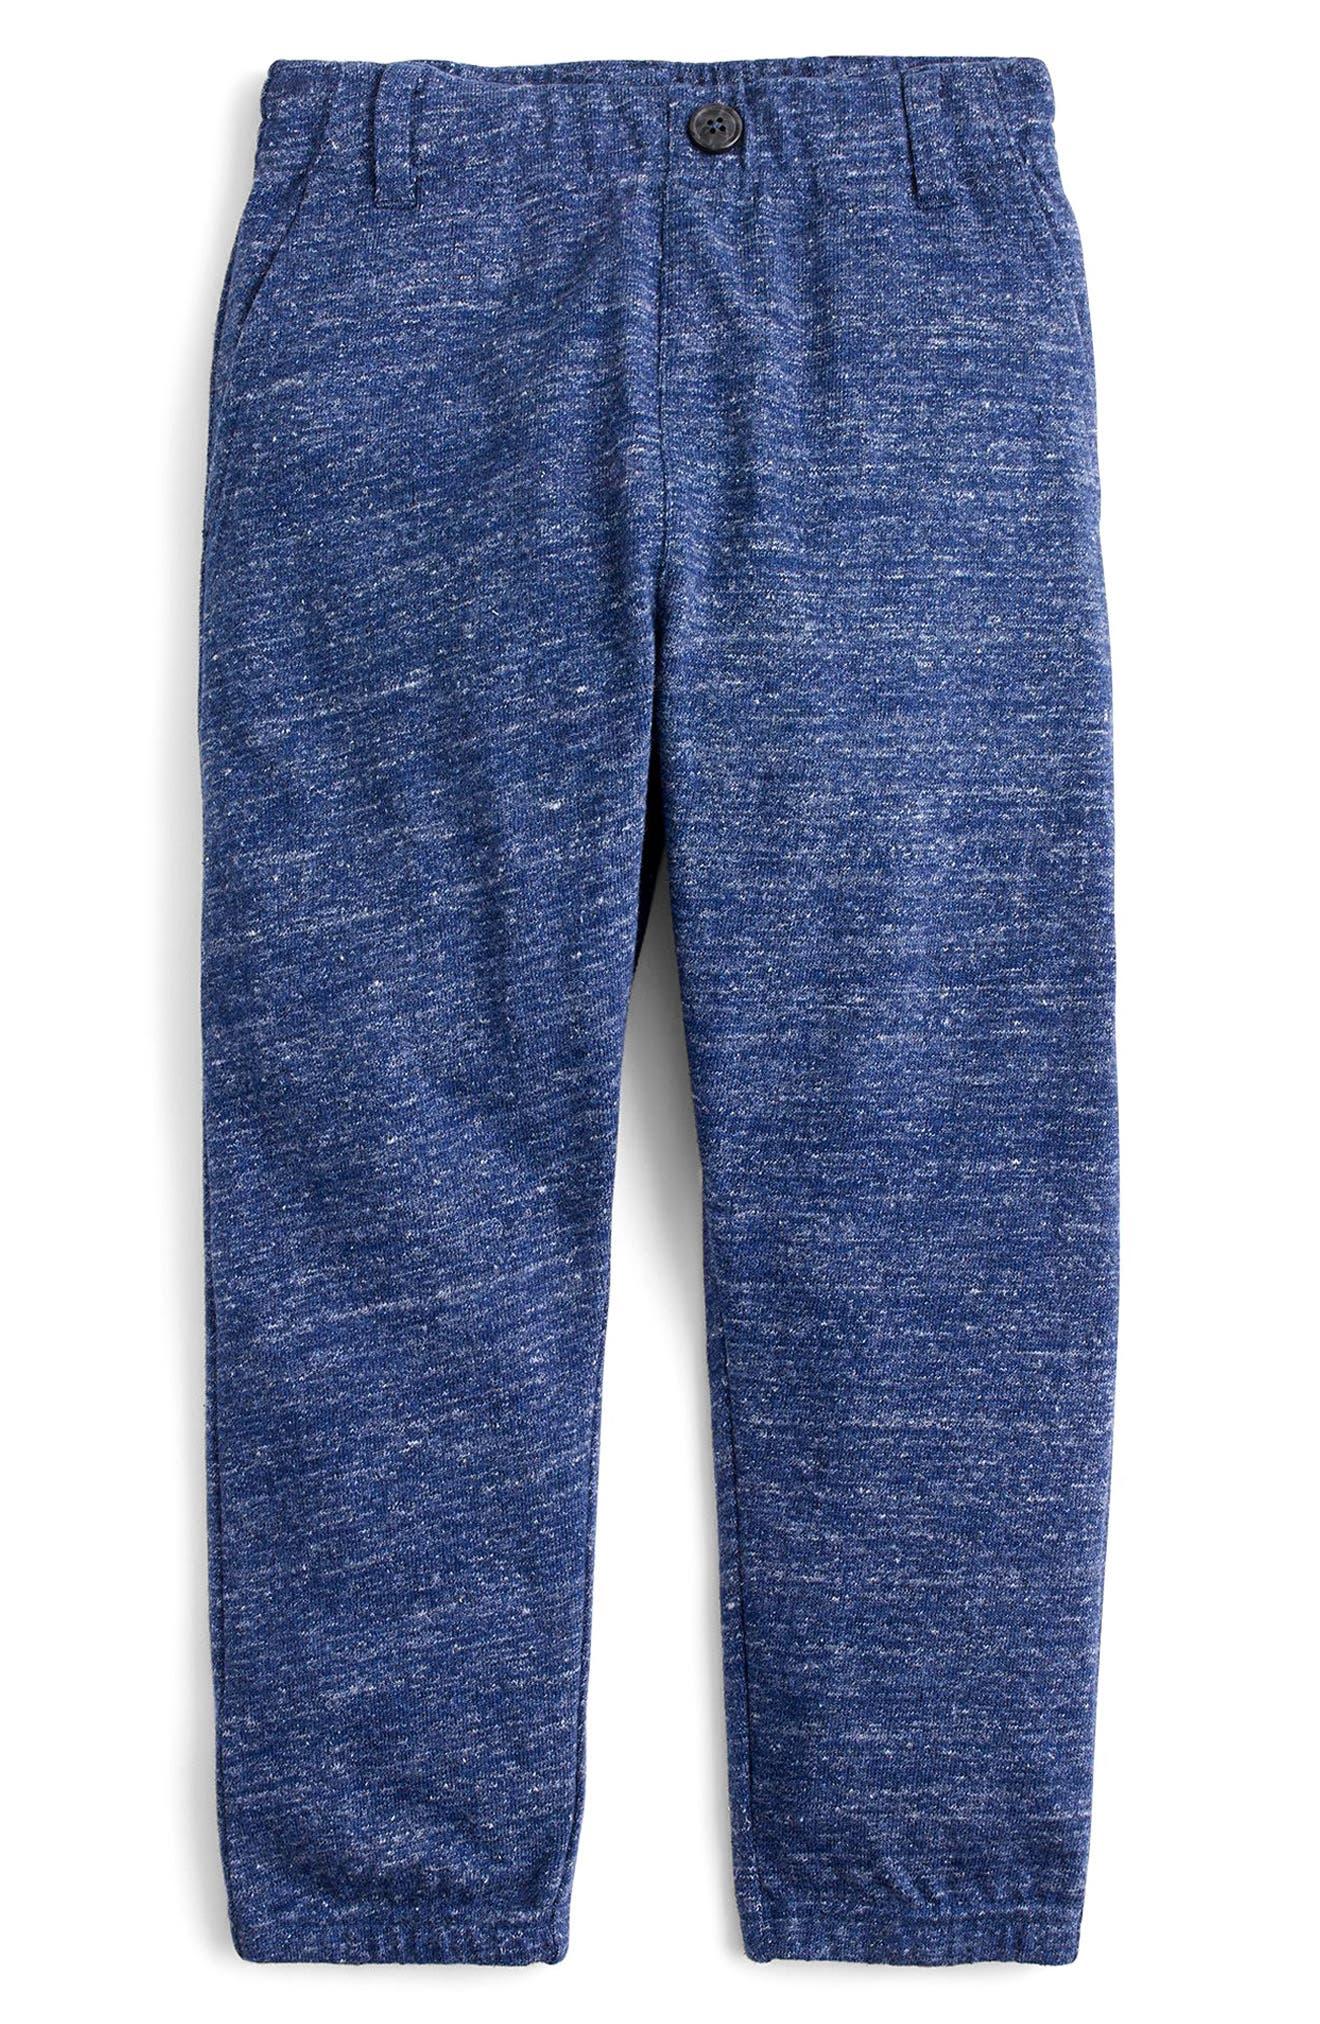 crewcuts by J.Crew Trouser Sweatpants (Toddler Boys, Little Boys & Big Boys)